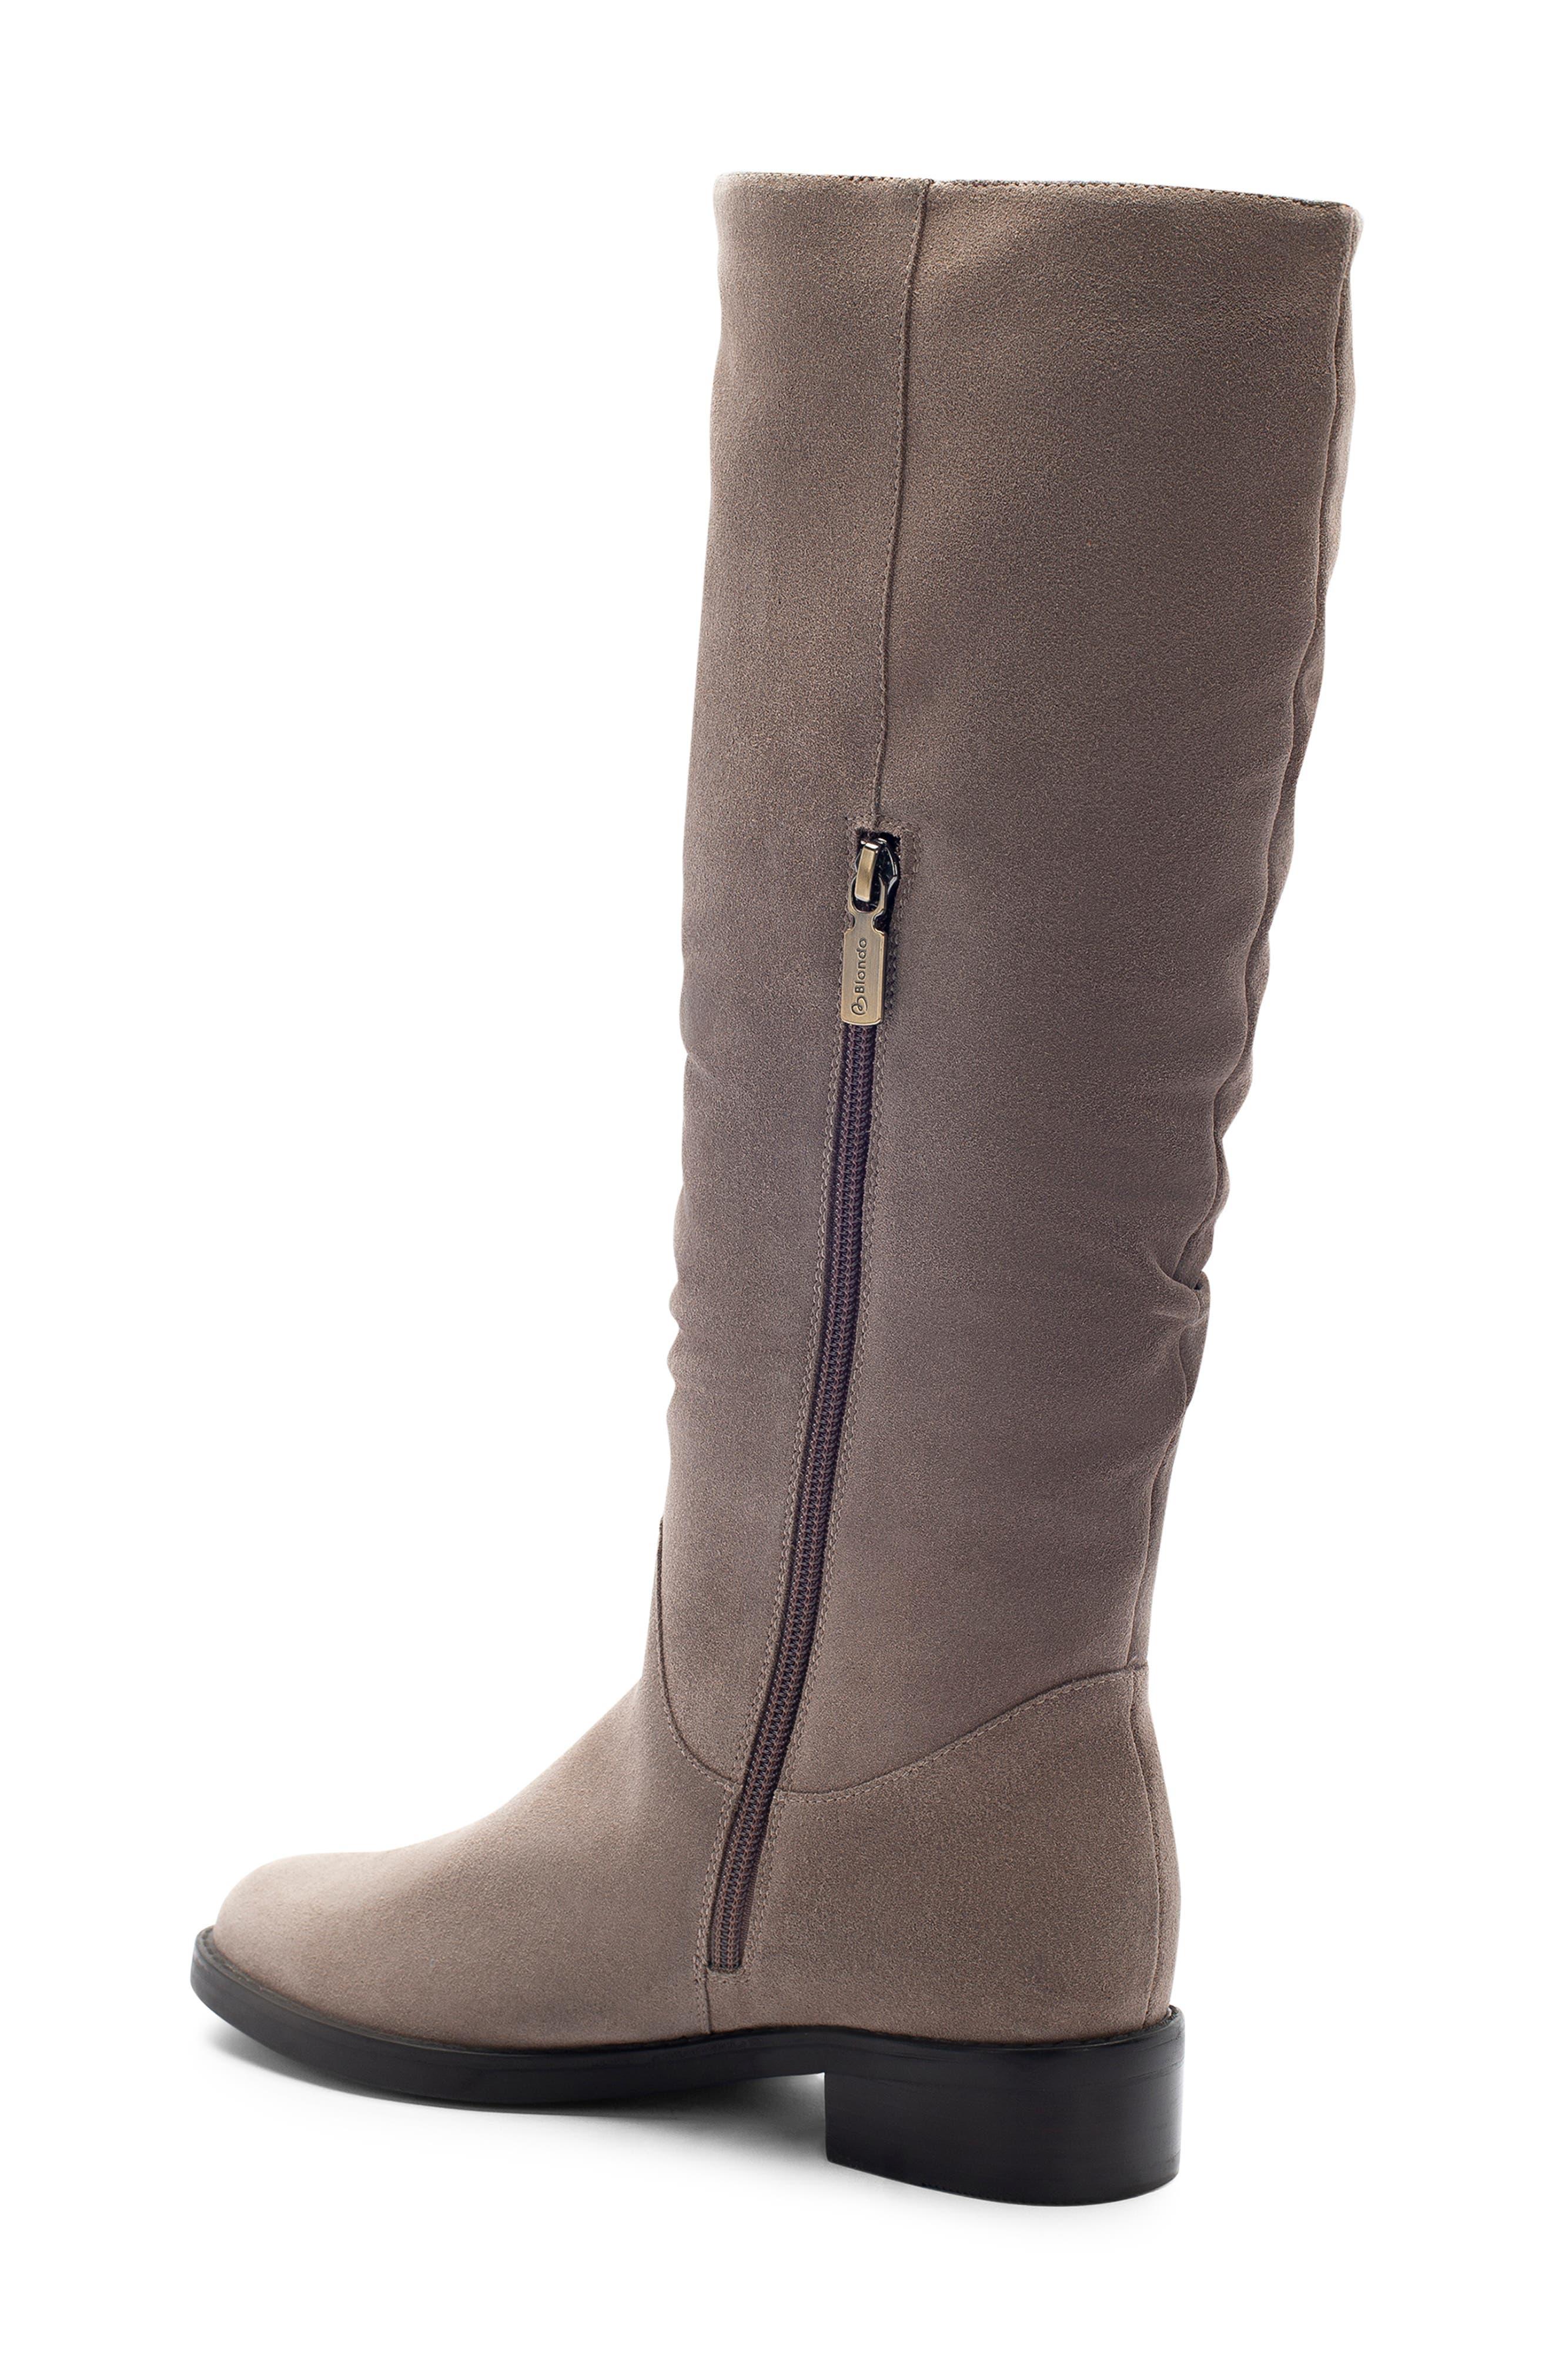 Erika Waterproof Knee High Boot,                             Alternate thumbnail 2, color,                             DARK TAUPE SUEDE